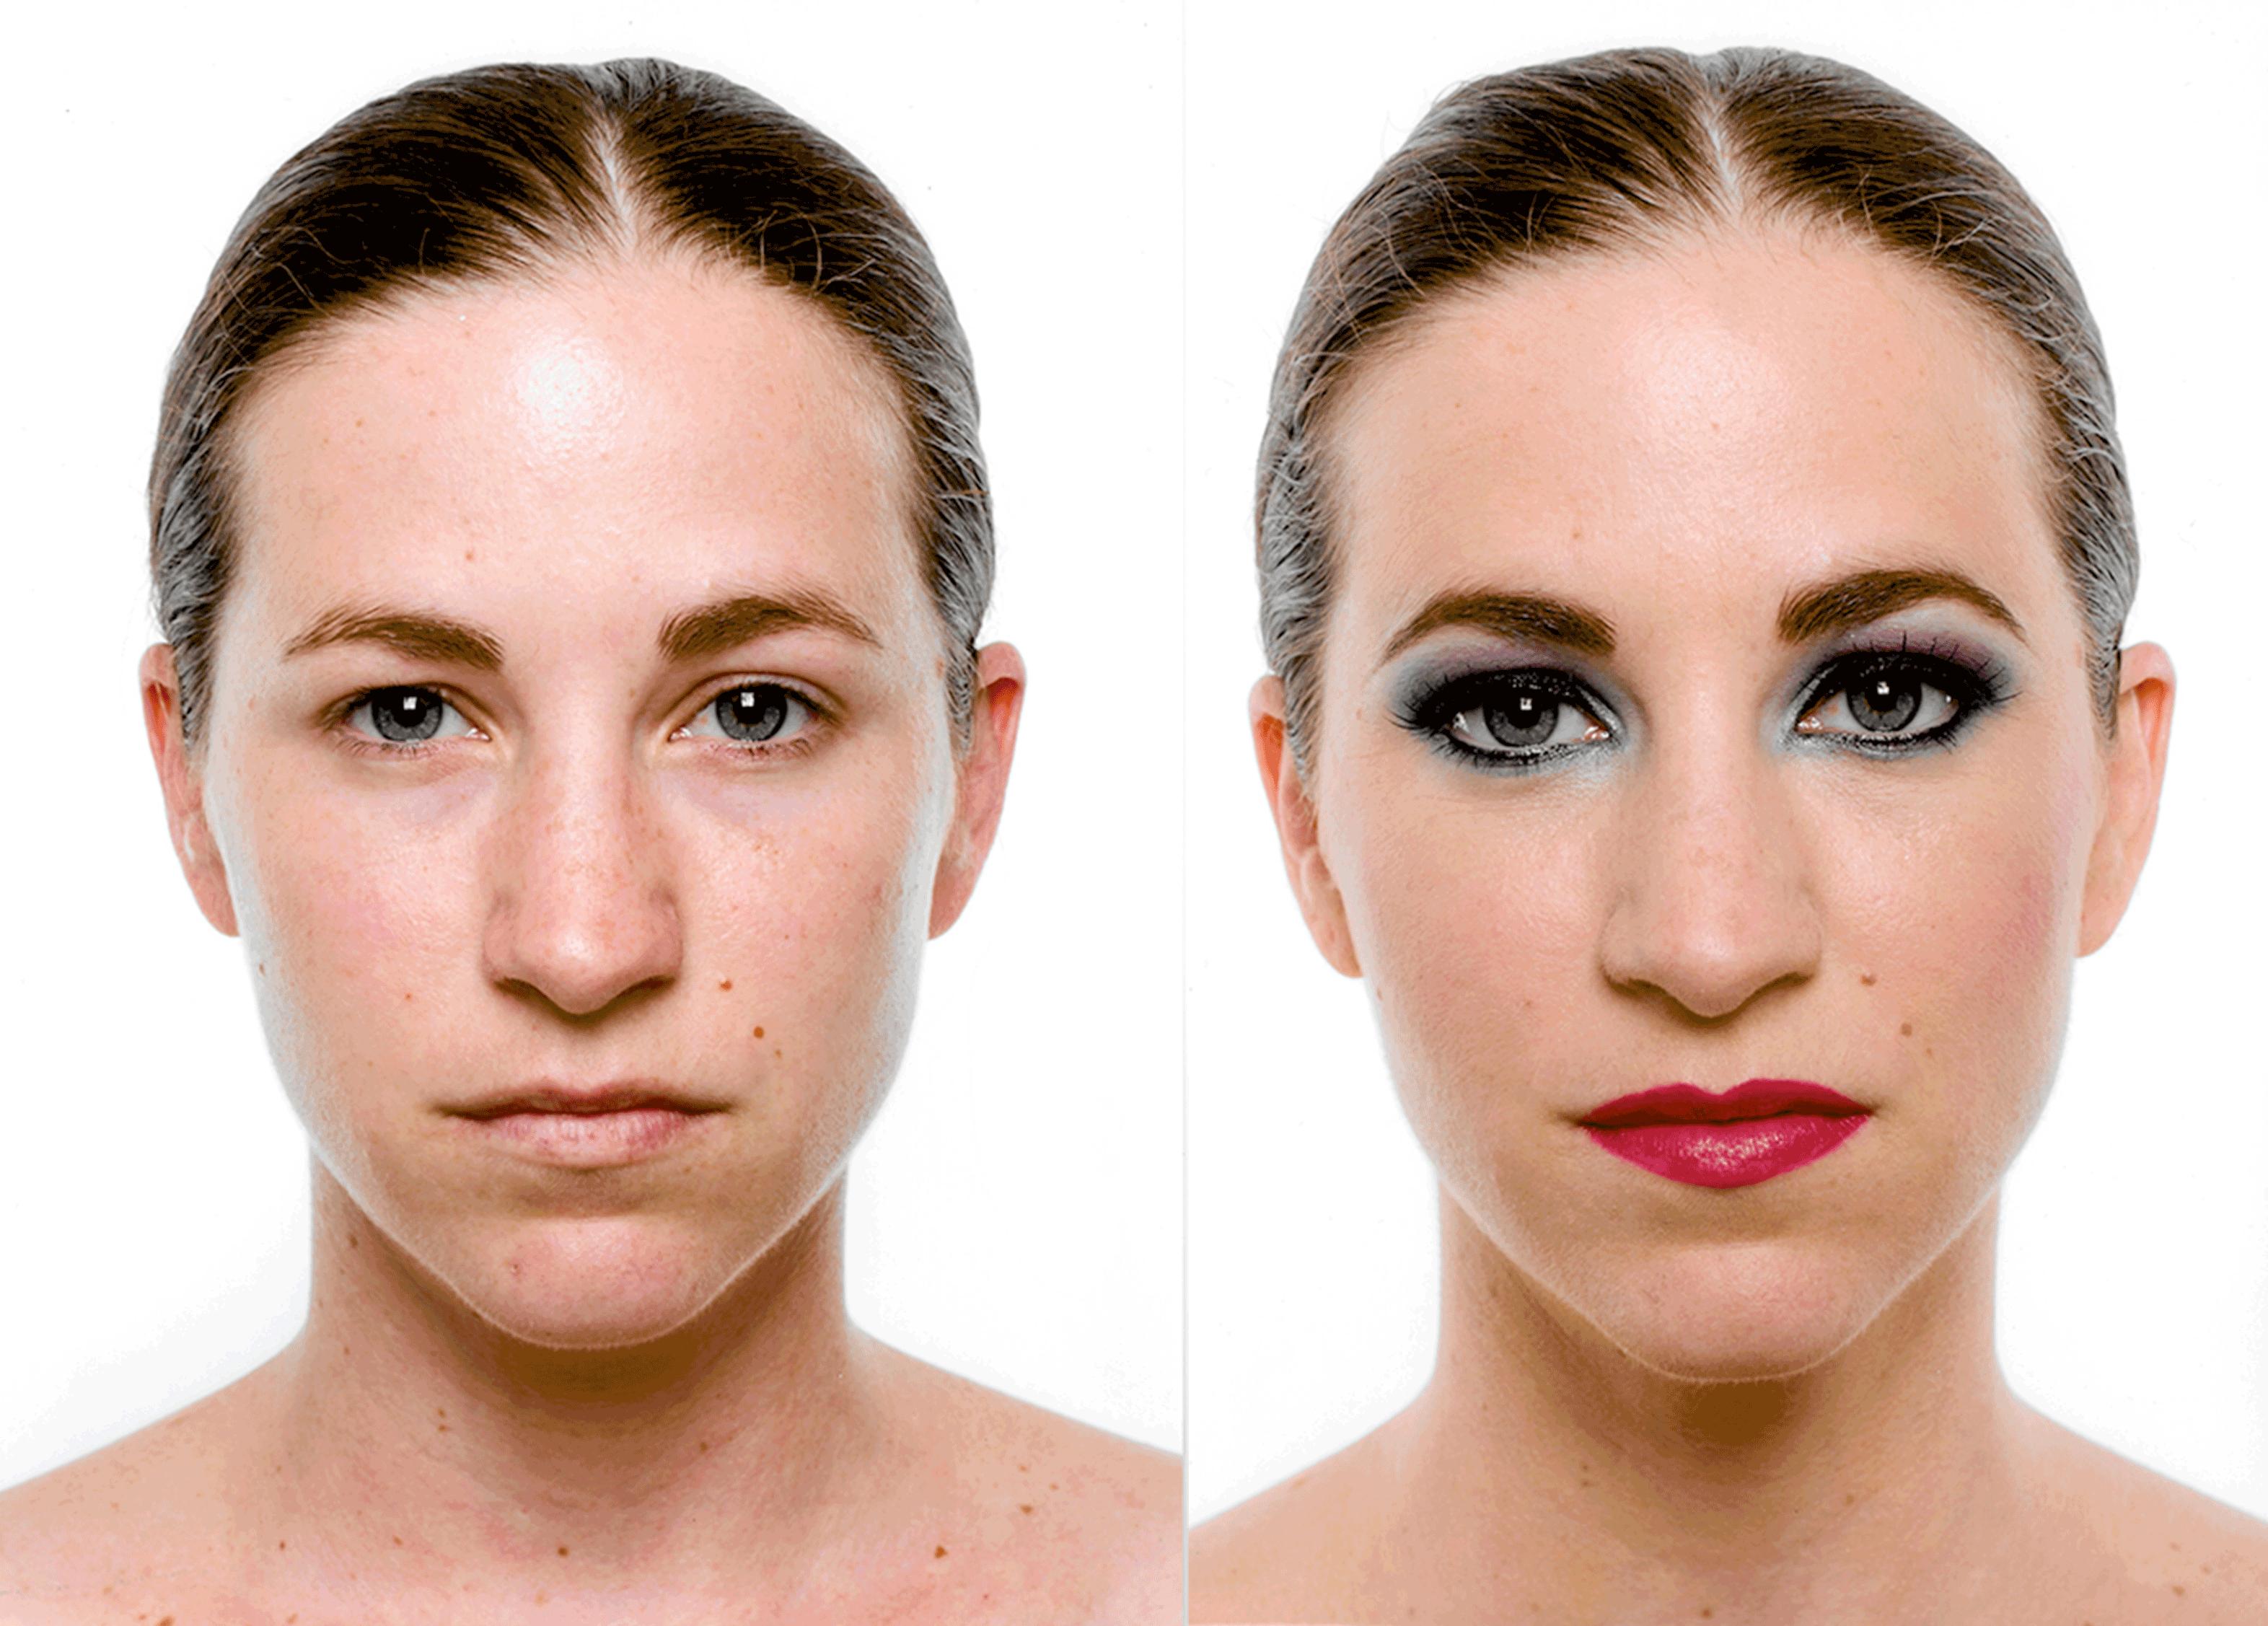 Glamour photoshoot, voor en na foto.   #mua #visagie #hoorn #visagiste #noordholland #maccosmetics #eyeshadow #makeup #seablue #lila #shading #foundation #softandgentle #pinklips #roselipstick #artofcolors